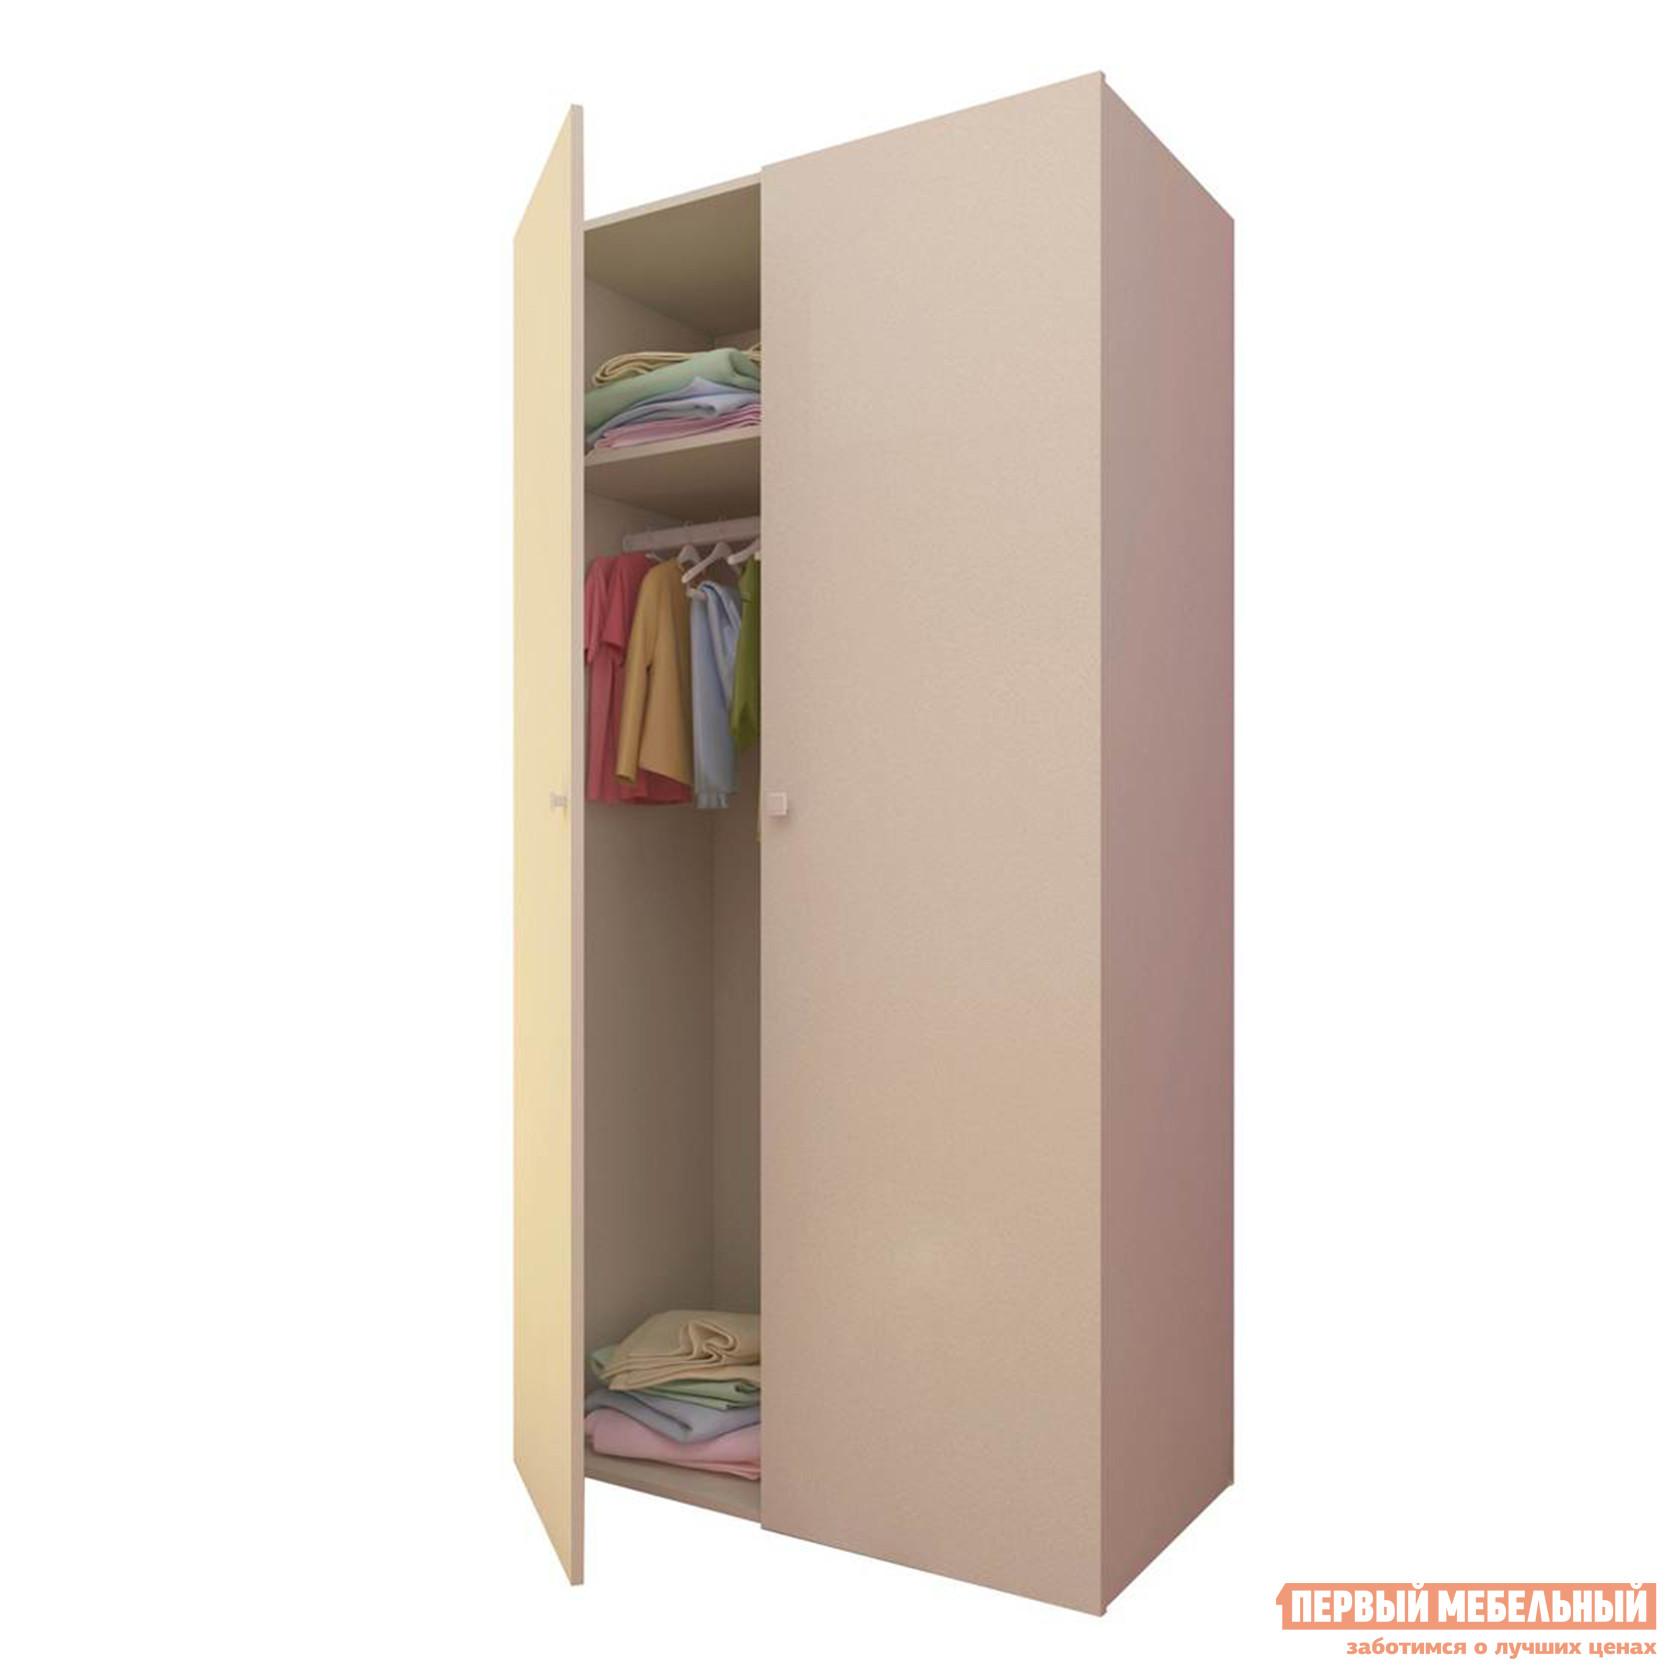 Шкаф детский ВПК Шкаф двухсекционный Polini kids Simple